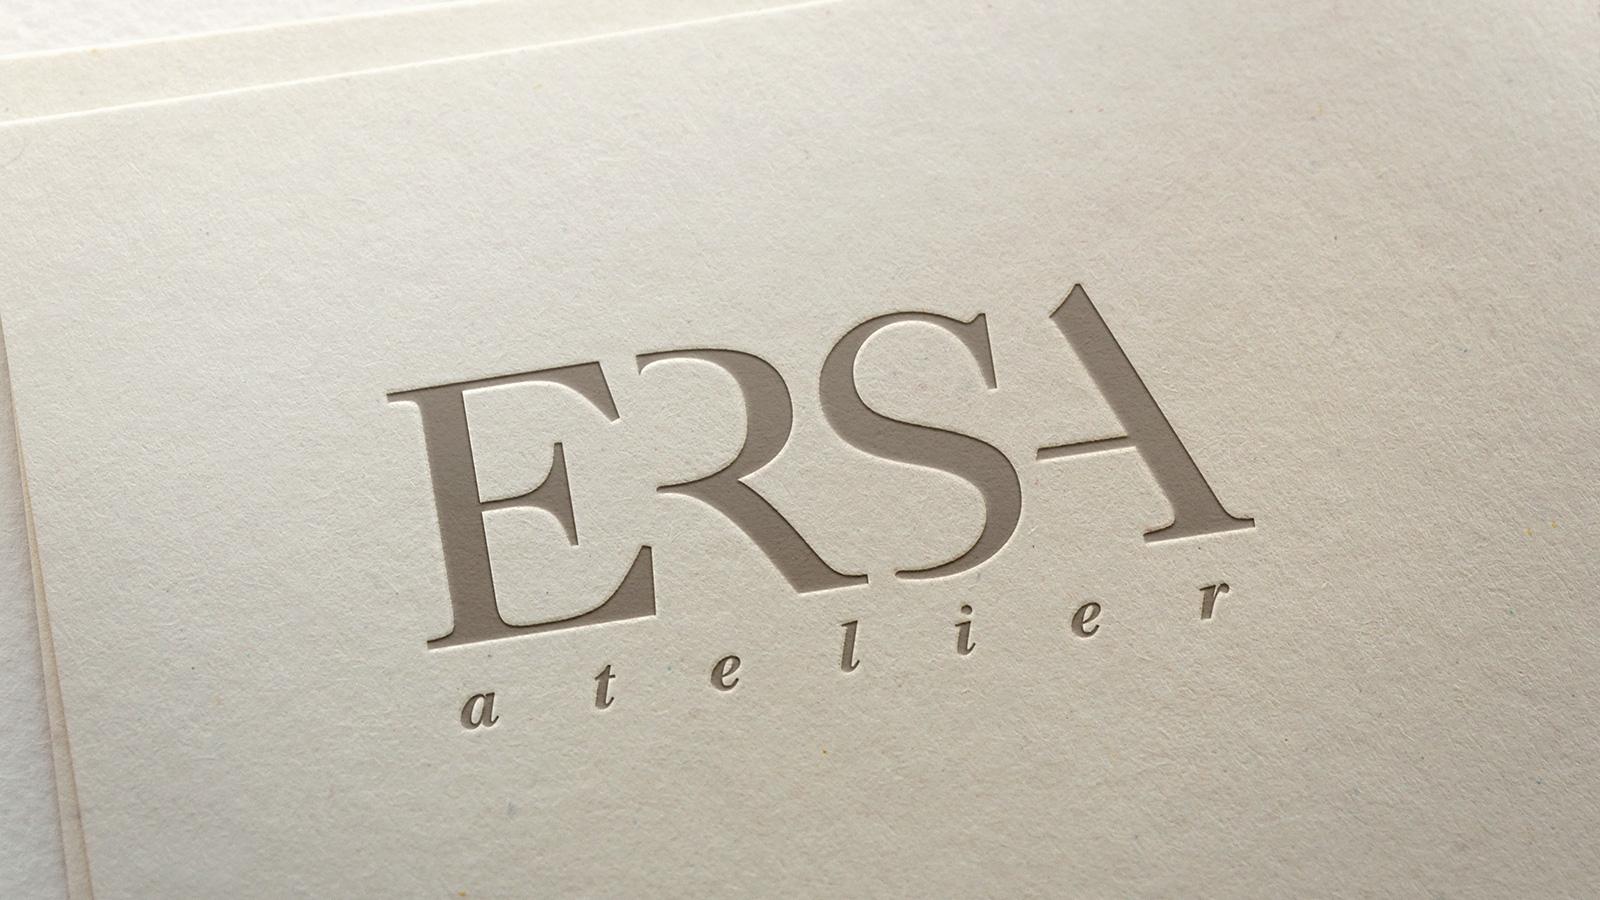 Ersa Atelier